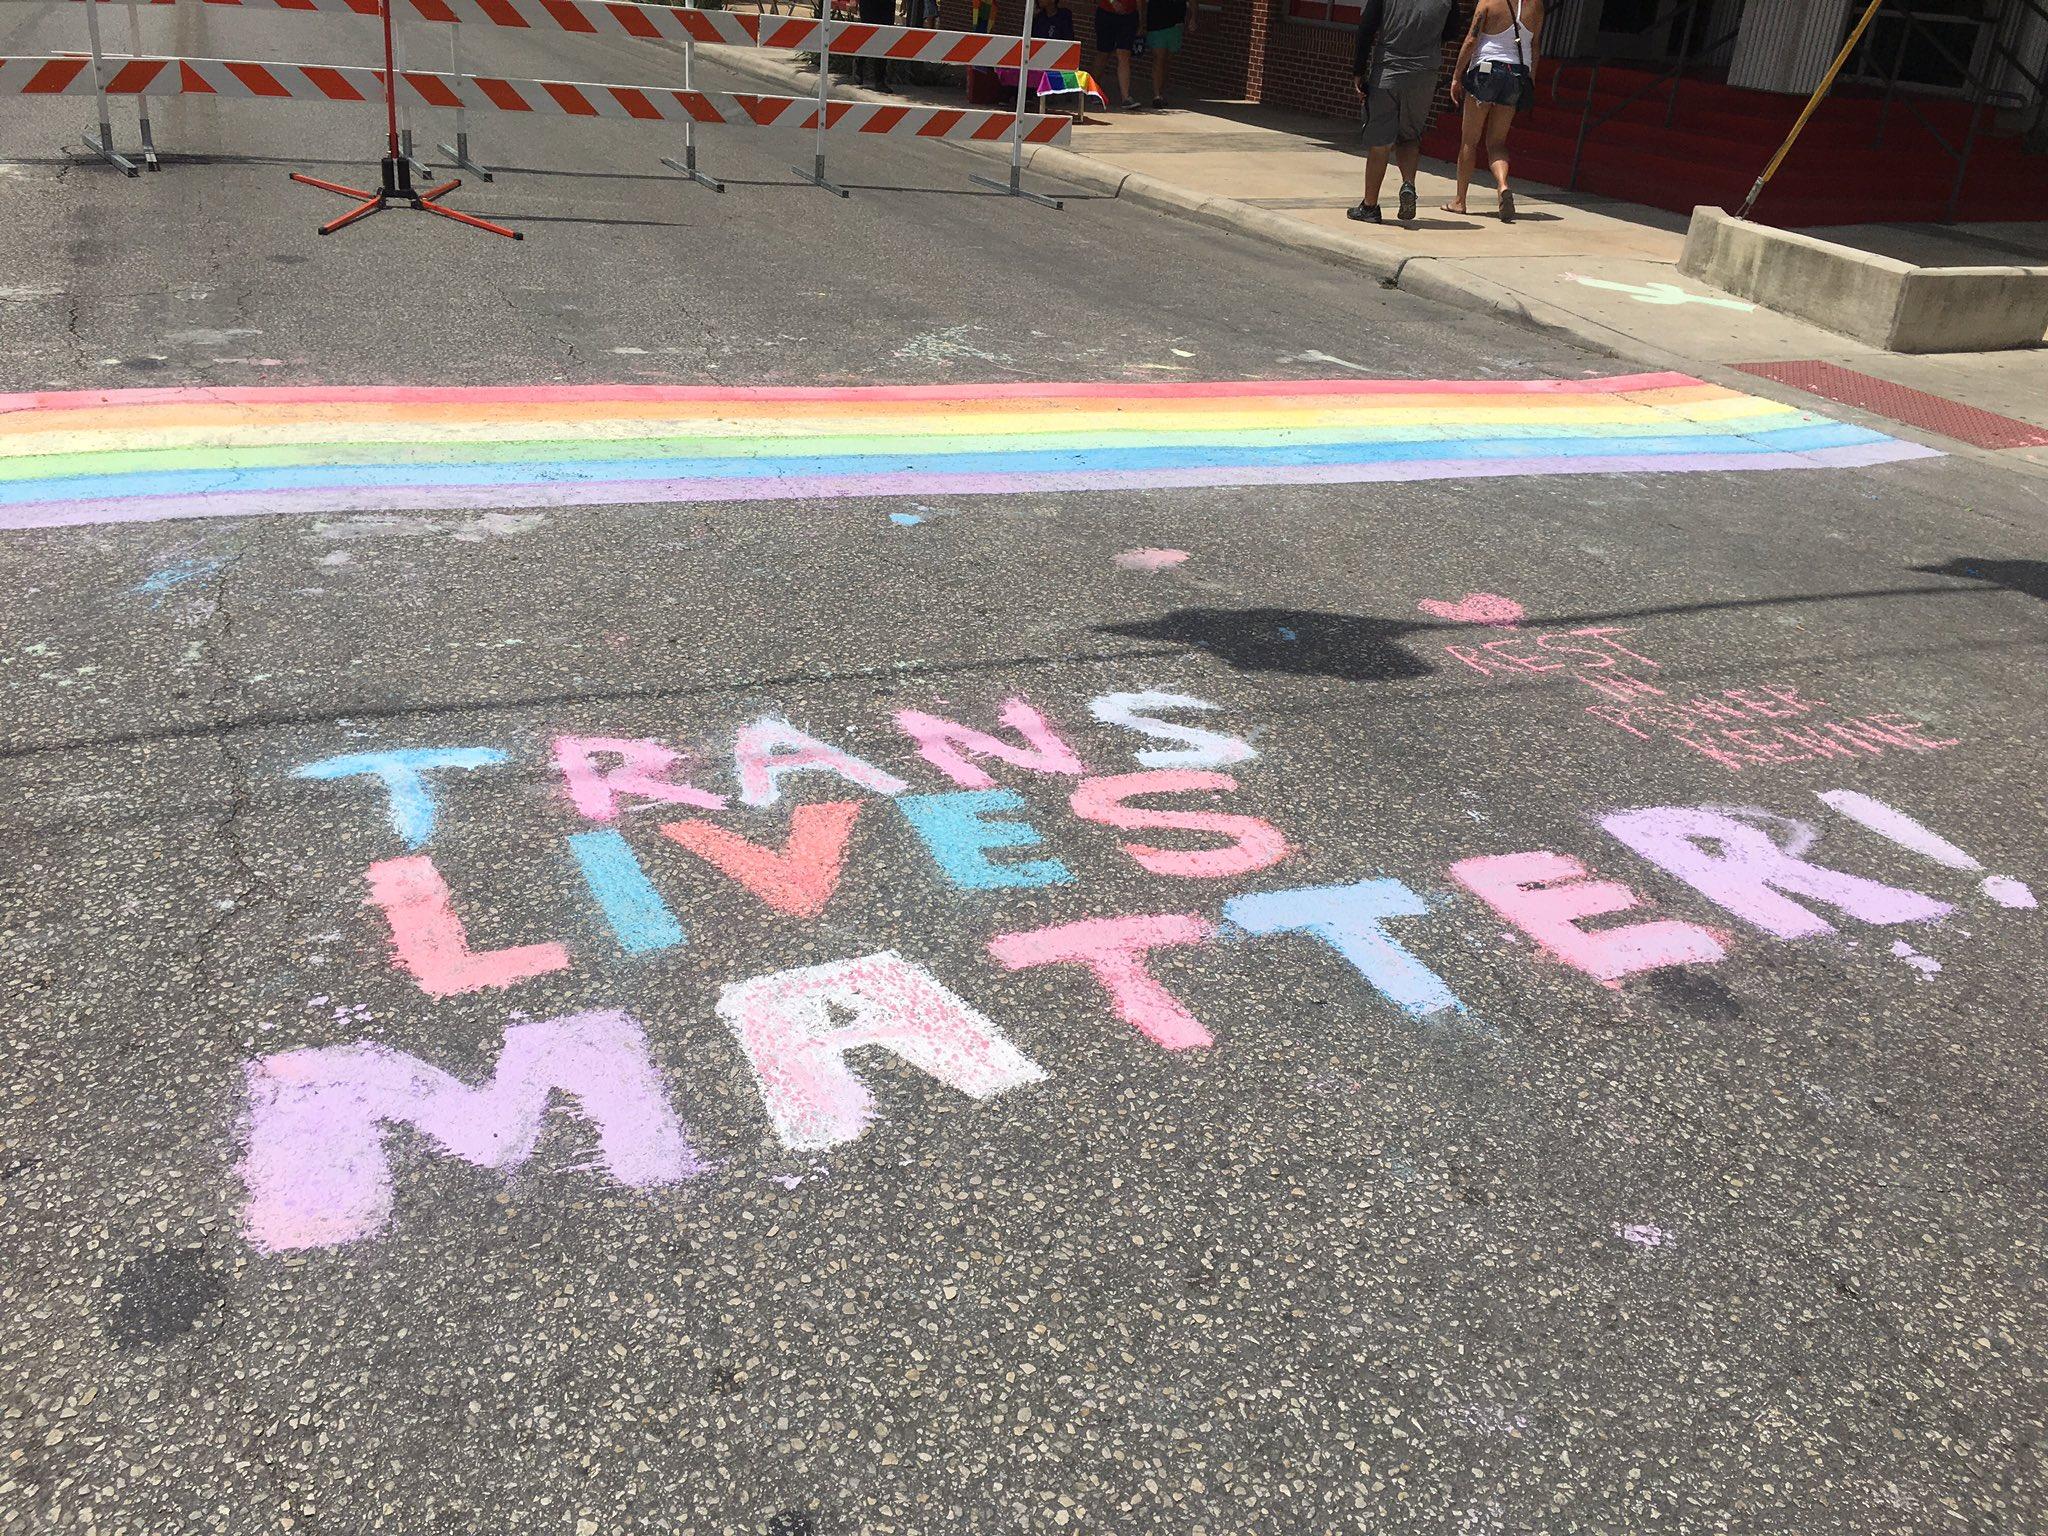 """Trans Lives Matter"" added below chalk rainbow crosswalk at Evergreen and N. Main ave. https://t.co/I5Z6NE7H56"